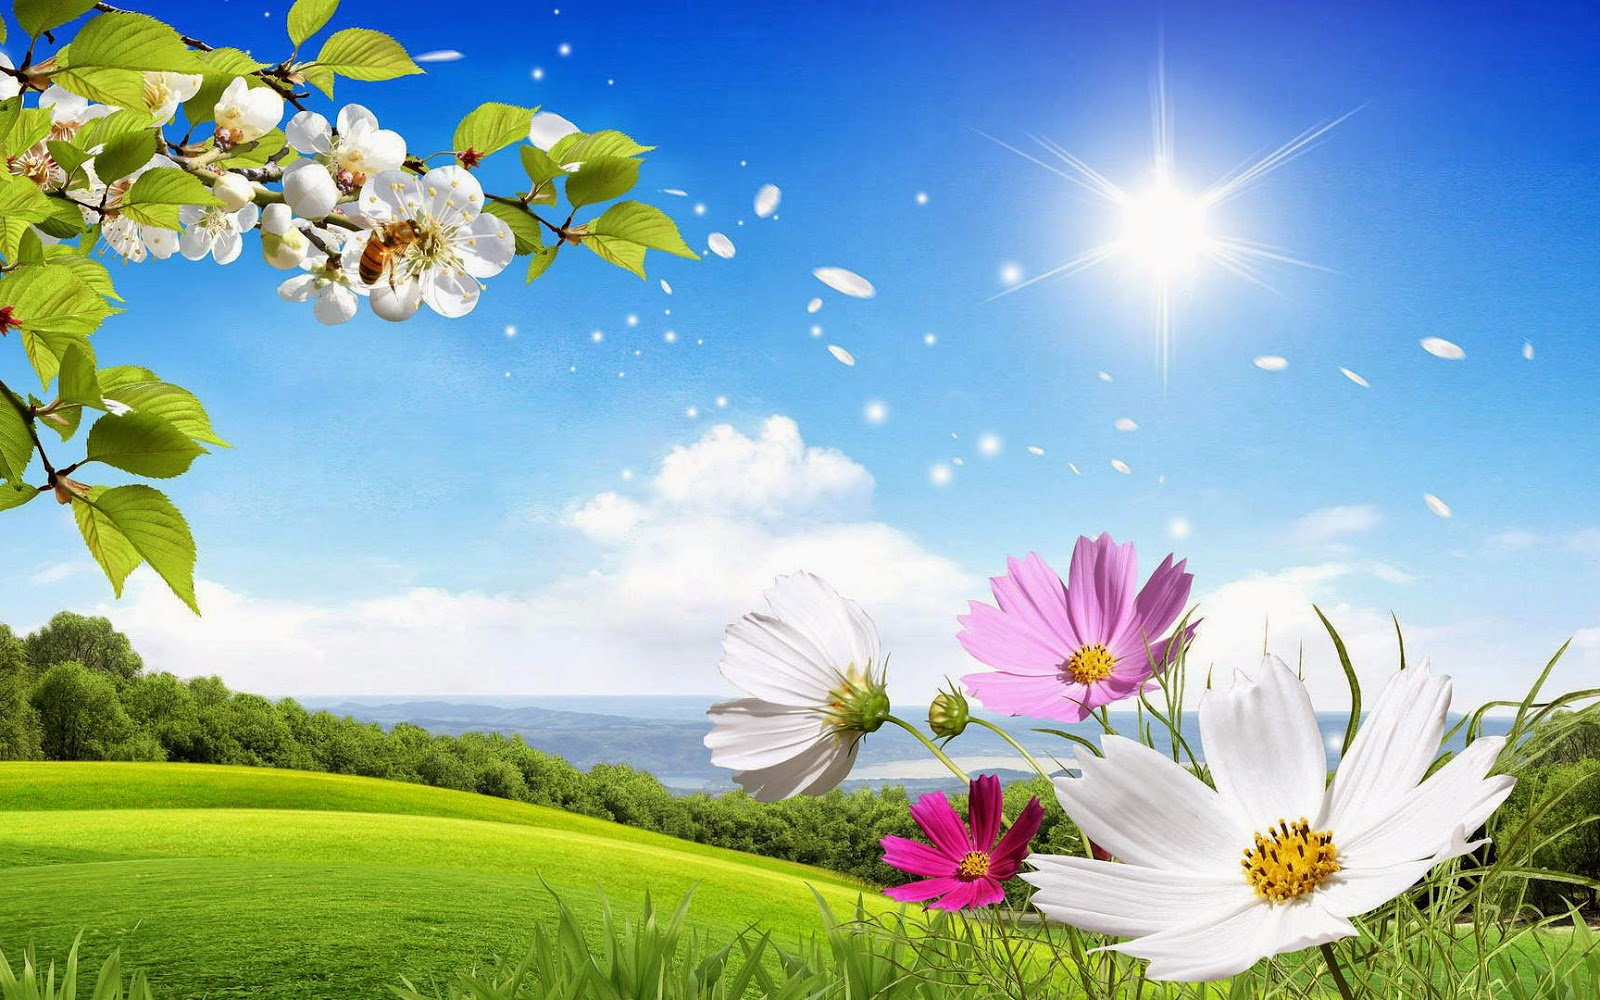 foto-zomer-wallpapers-hd-zomer-achtergronden-34-landschap-weiland-gras-bloemen-blauwe-lucht-zon